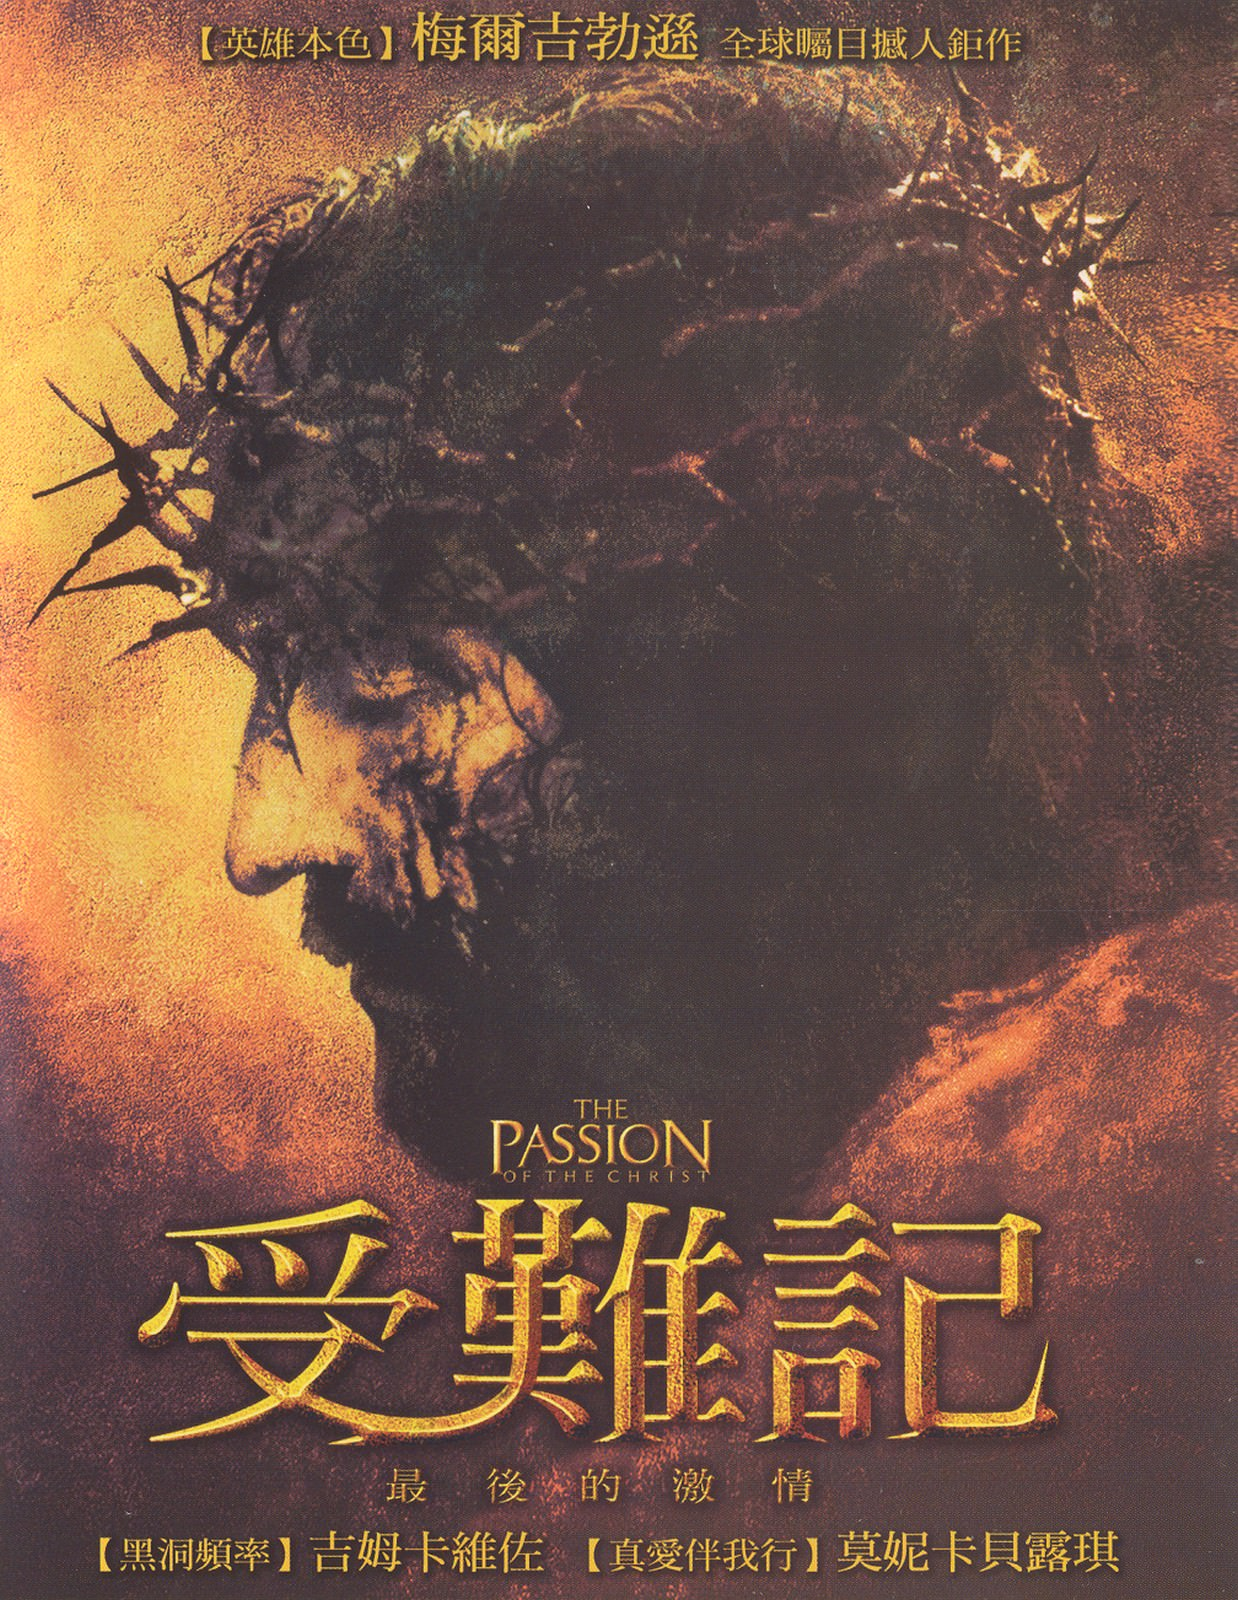 Movie, The Passion of the Christ(美國) / 受難記:最後的激情(台) / 耶稣受难记(中) / 受難曲(港), 電影海報, 台灣